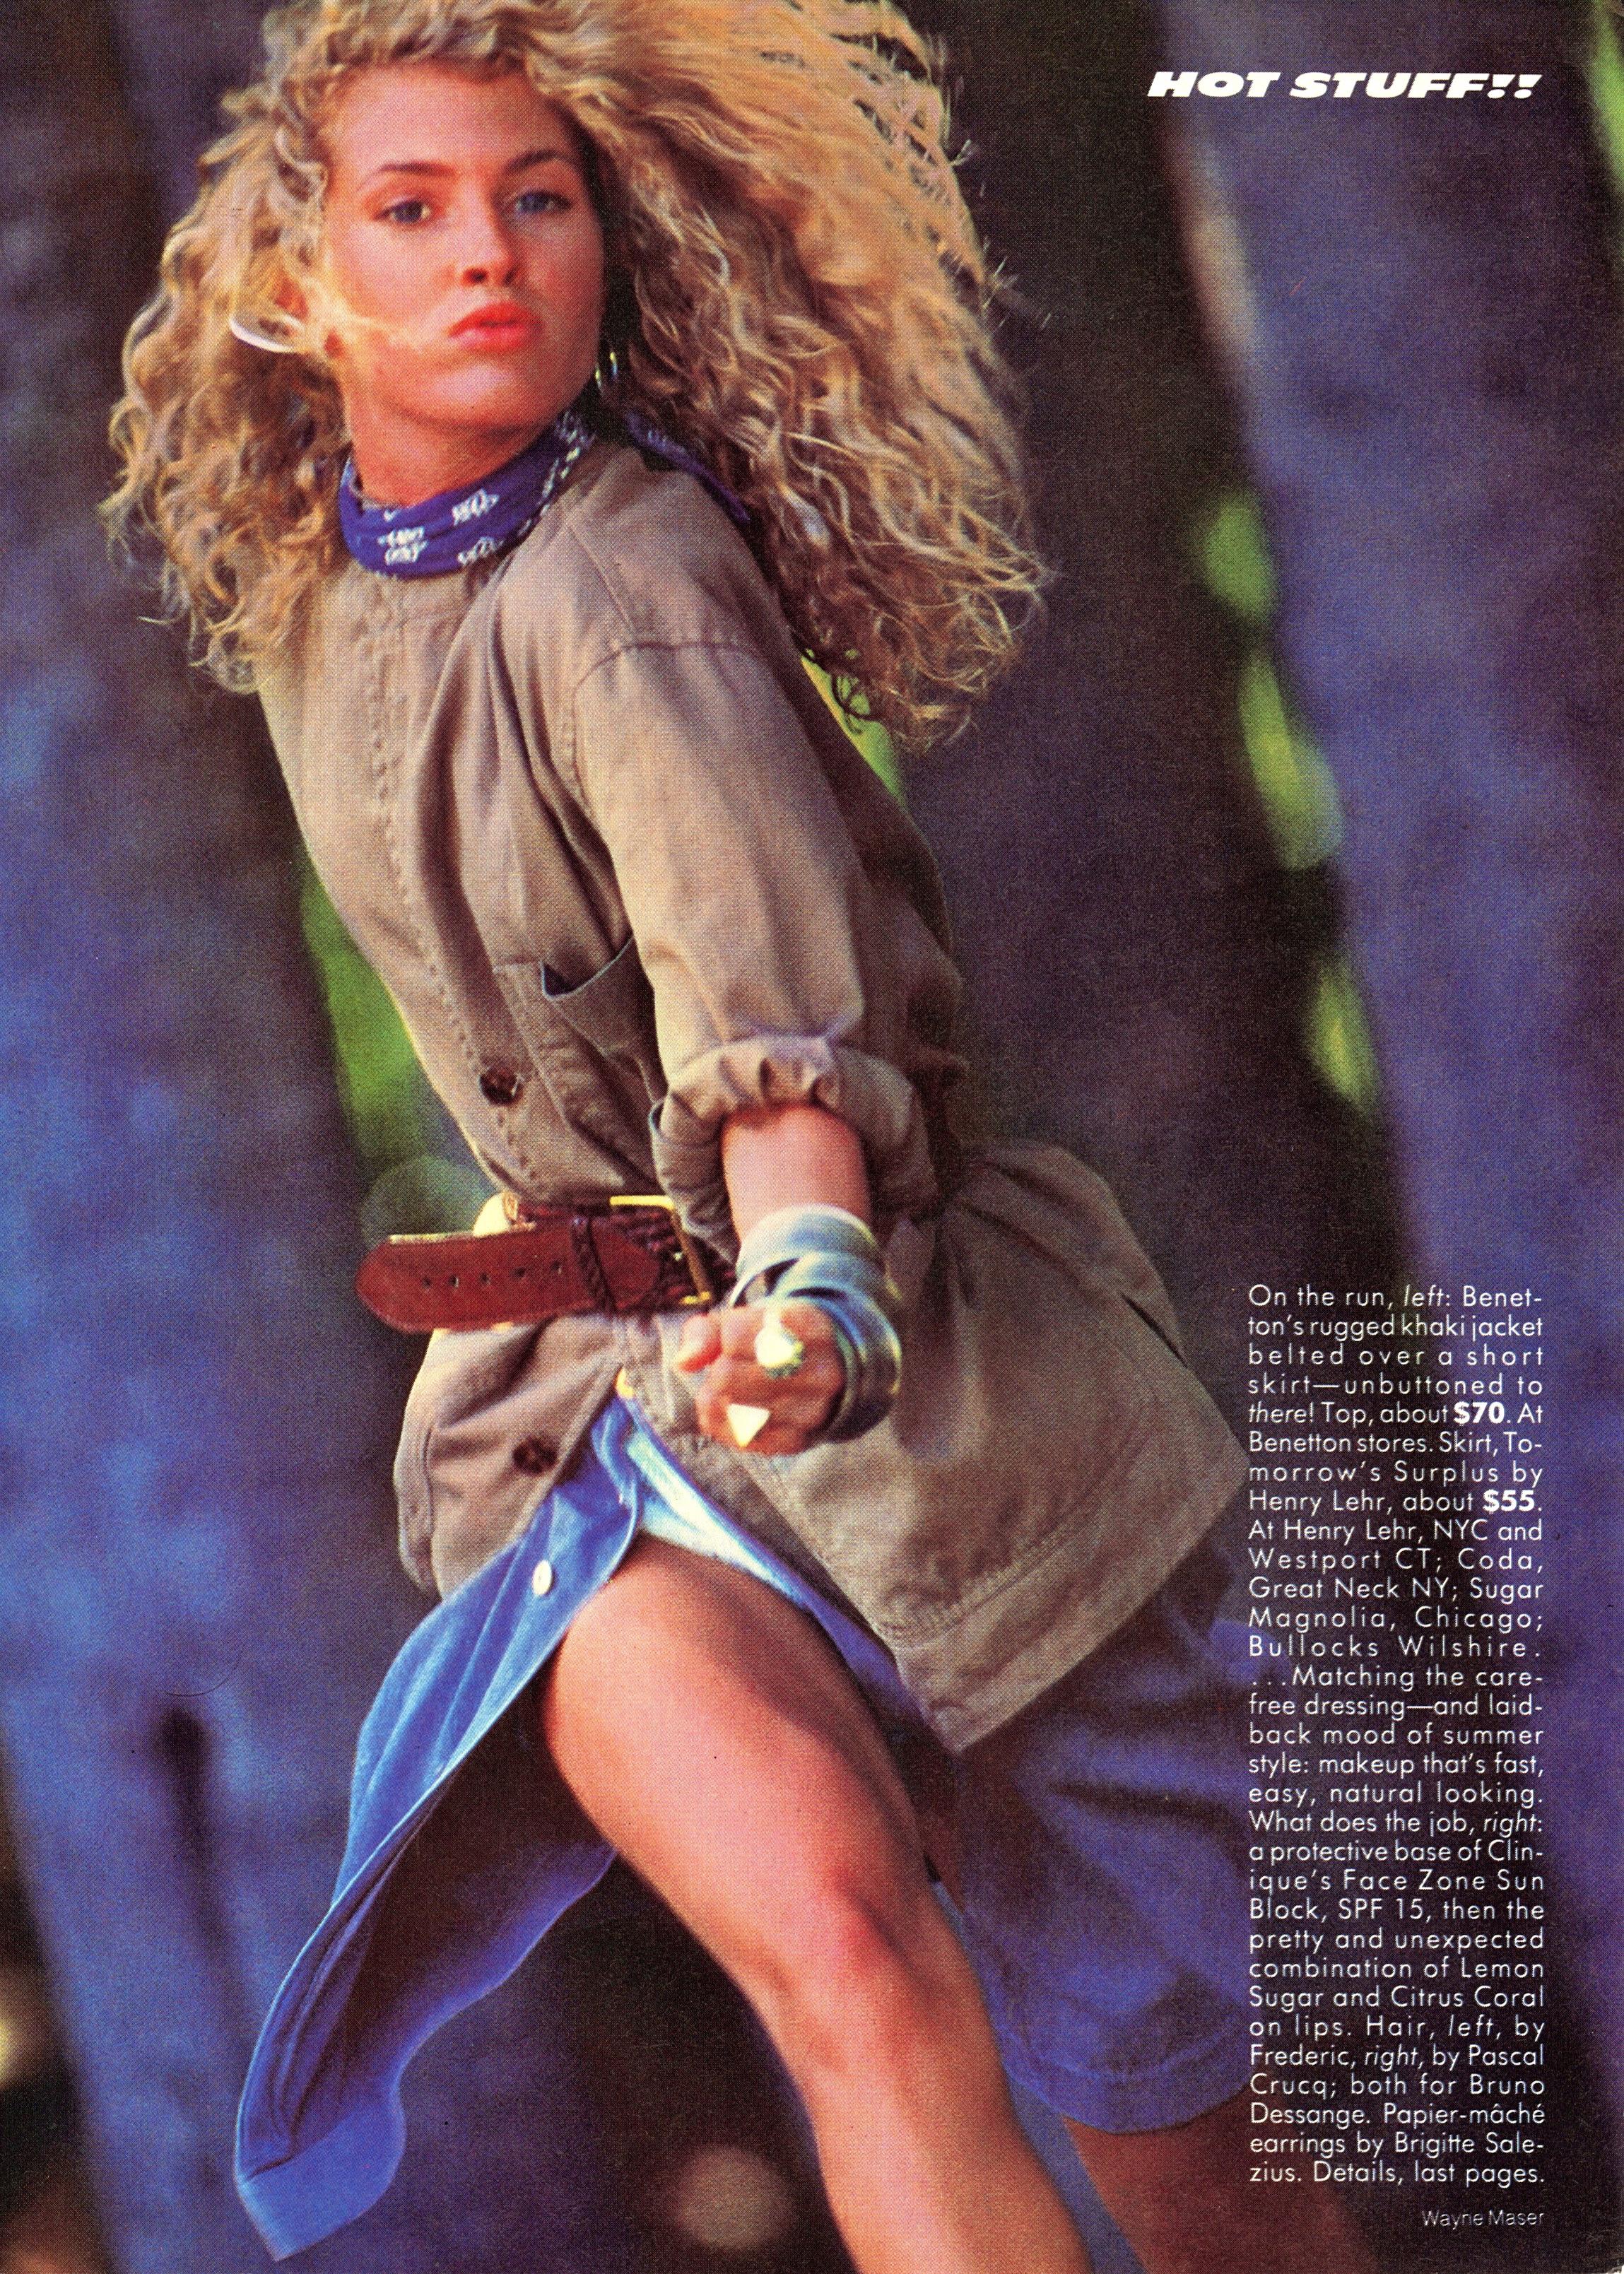 Vogue (US) June 1986 | Patty McHugh & Christy Turlington 03.jpg